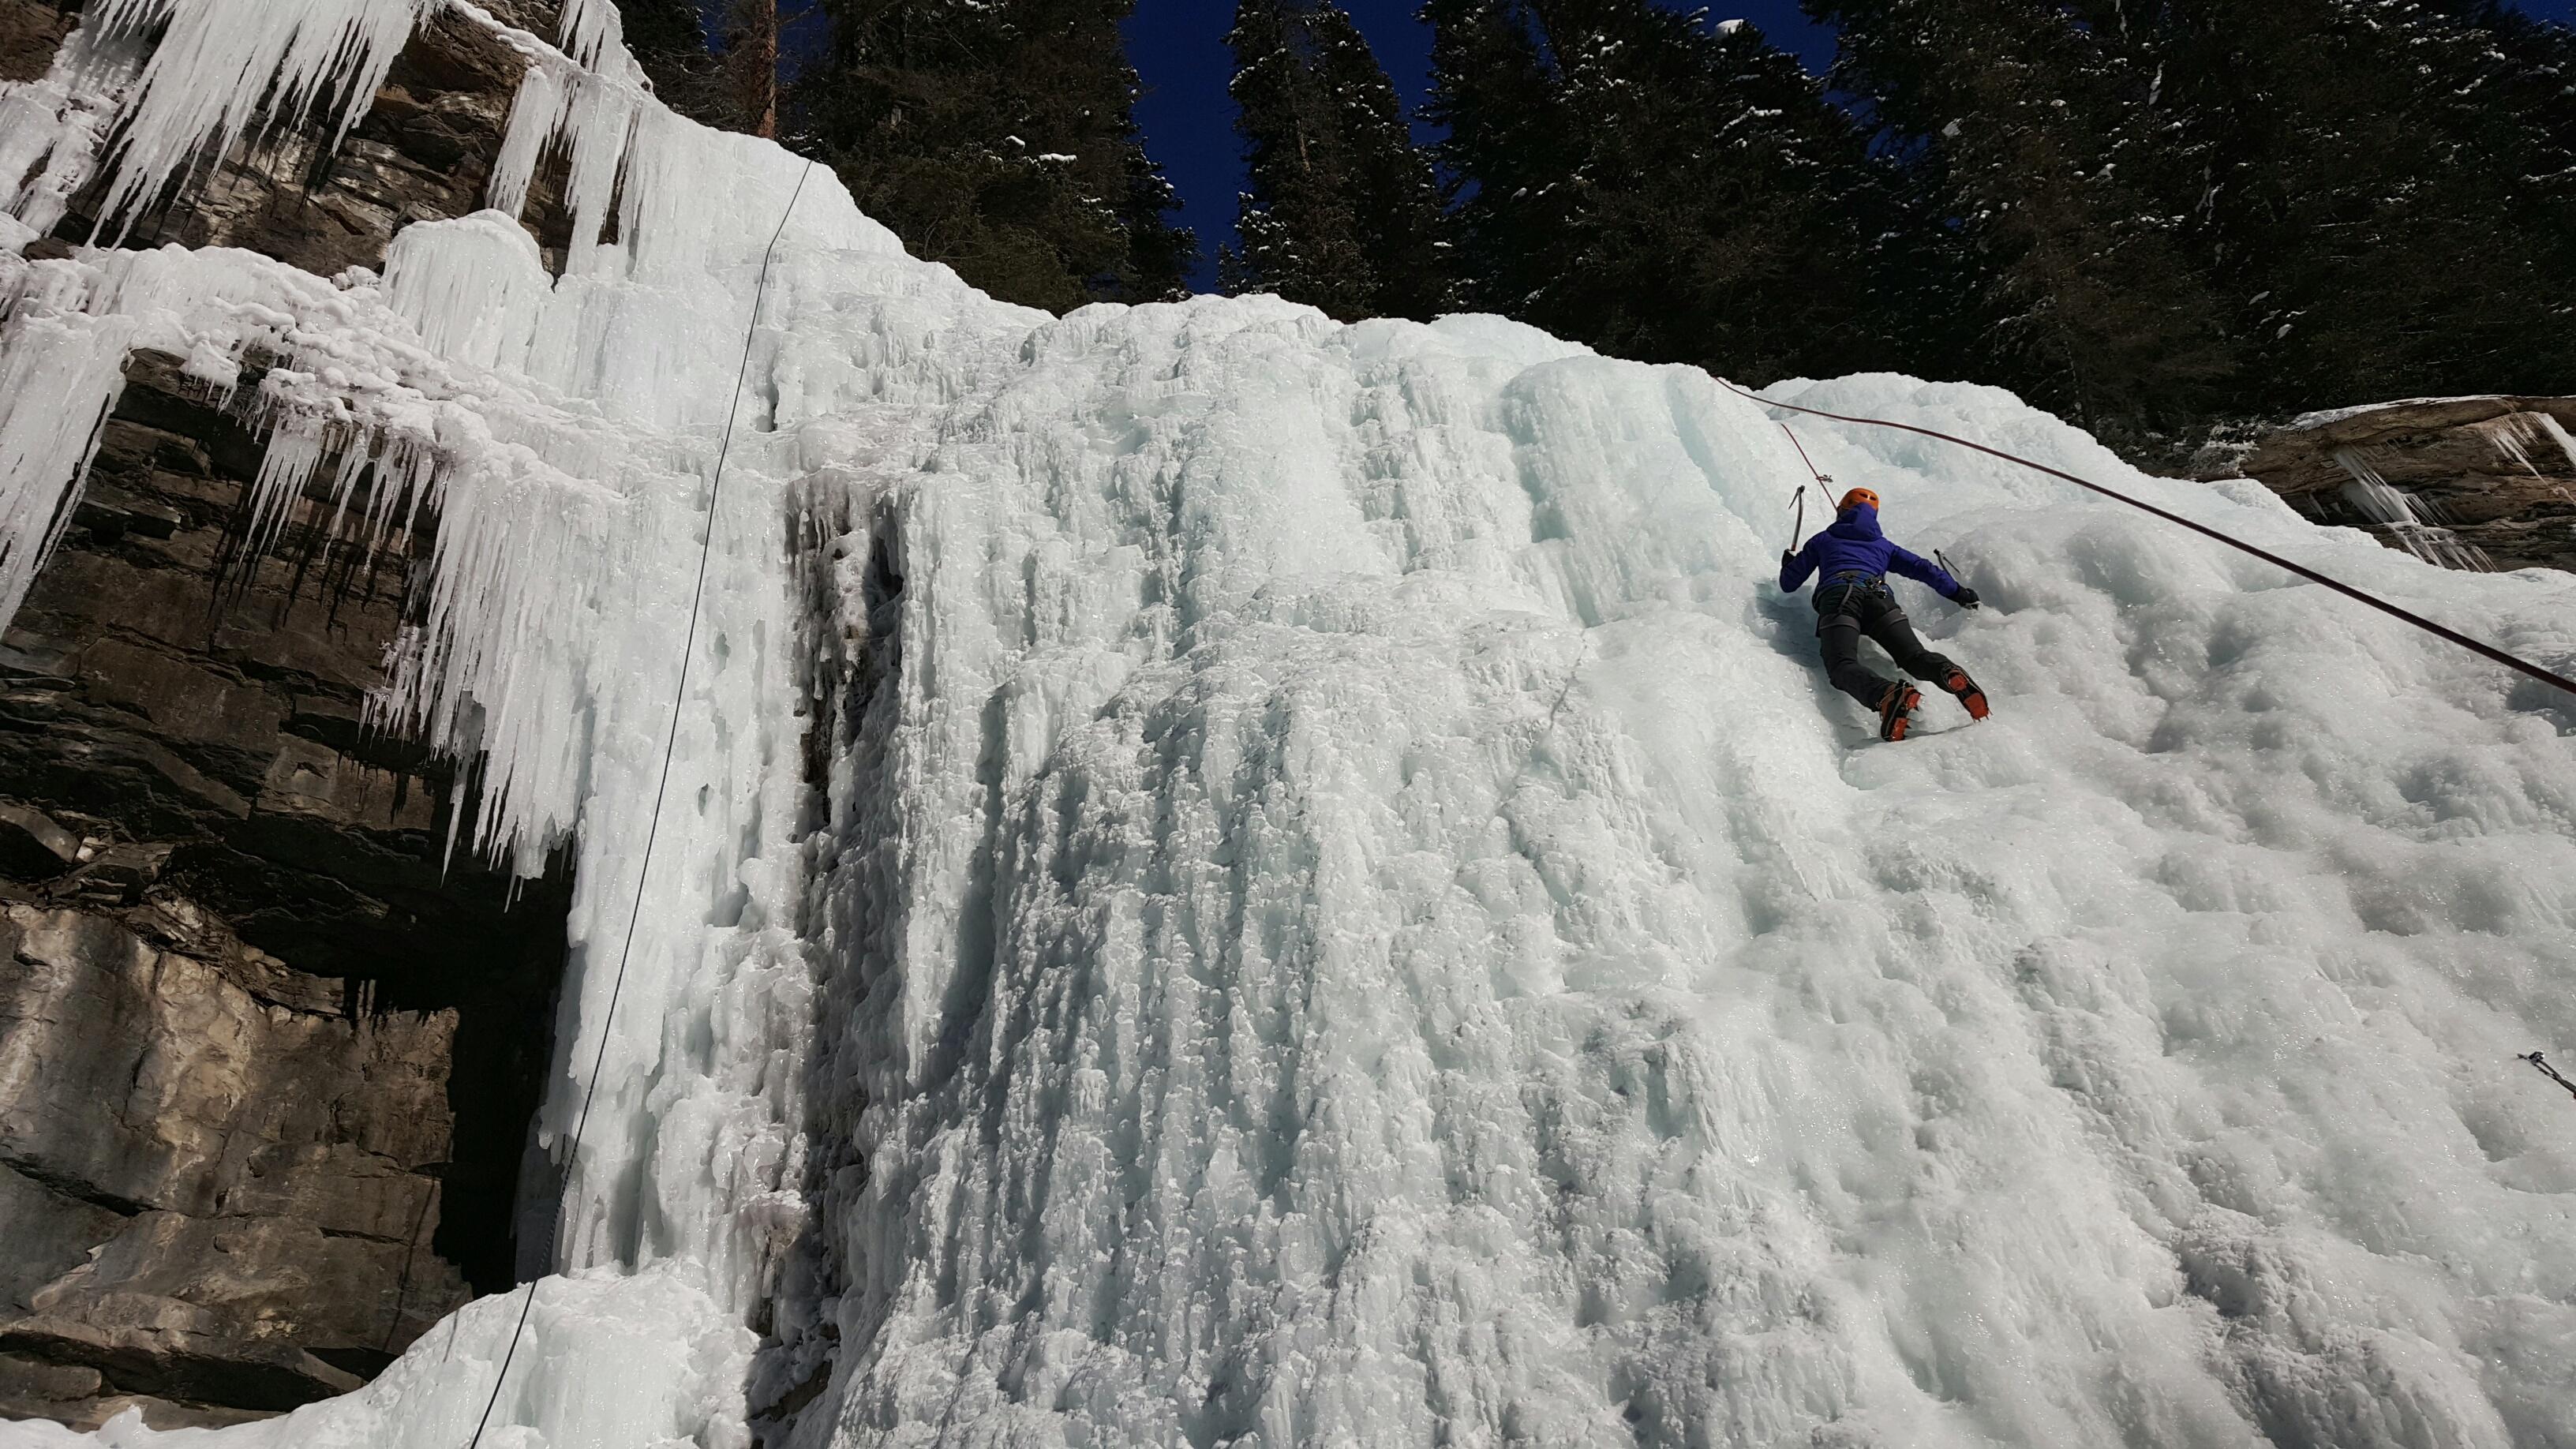 Fifteen Top Winter Activities in Alberta, Ice Climbing Johnston Canyon, Banff National Park, Alberta, Canada